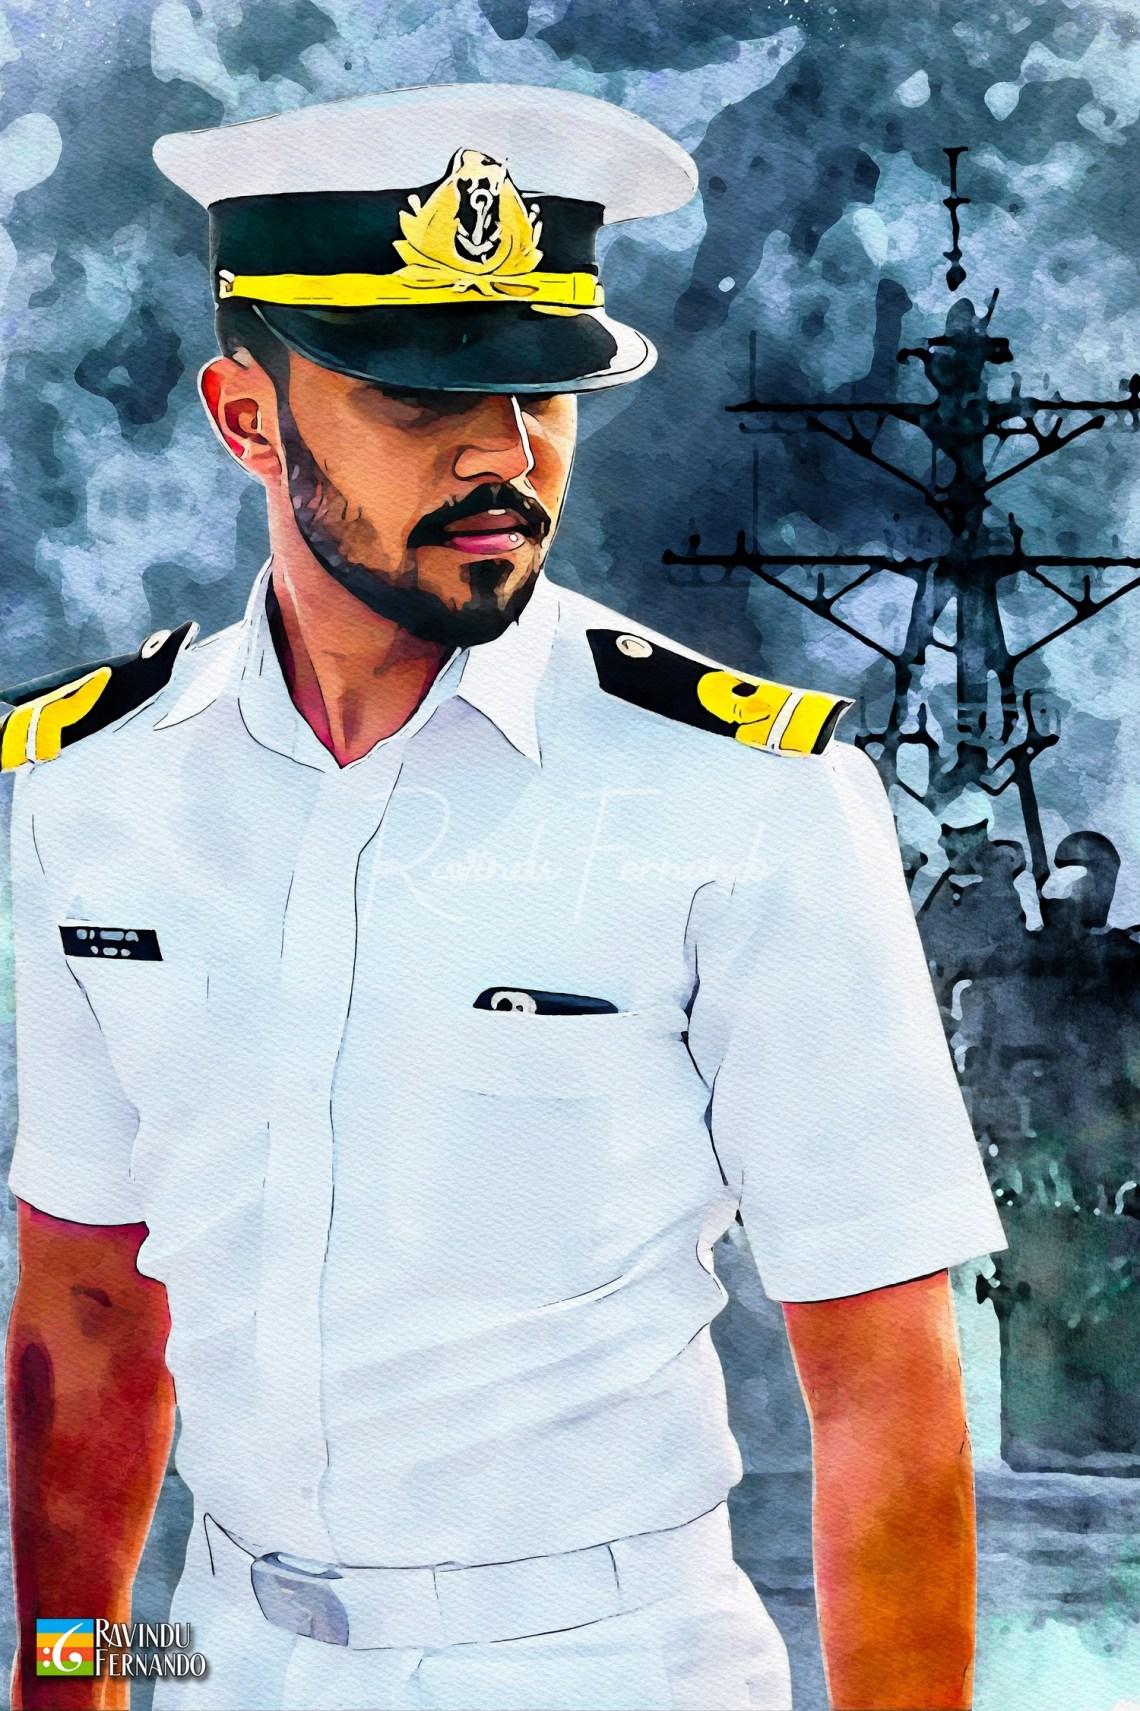 Navy Man - Digital Watercolor Painting